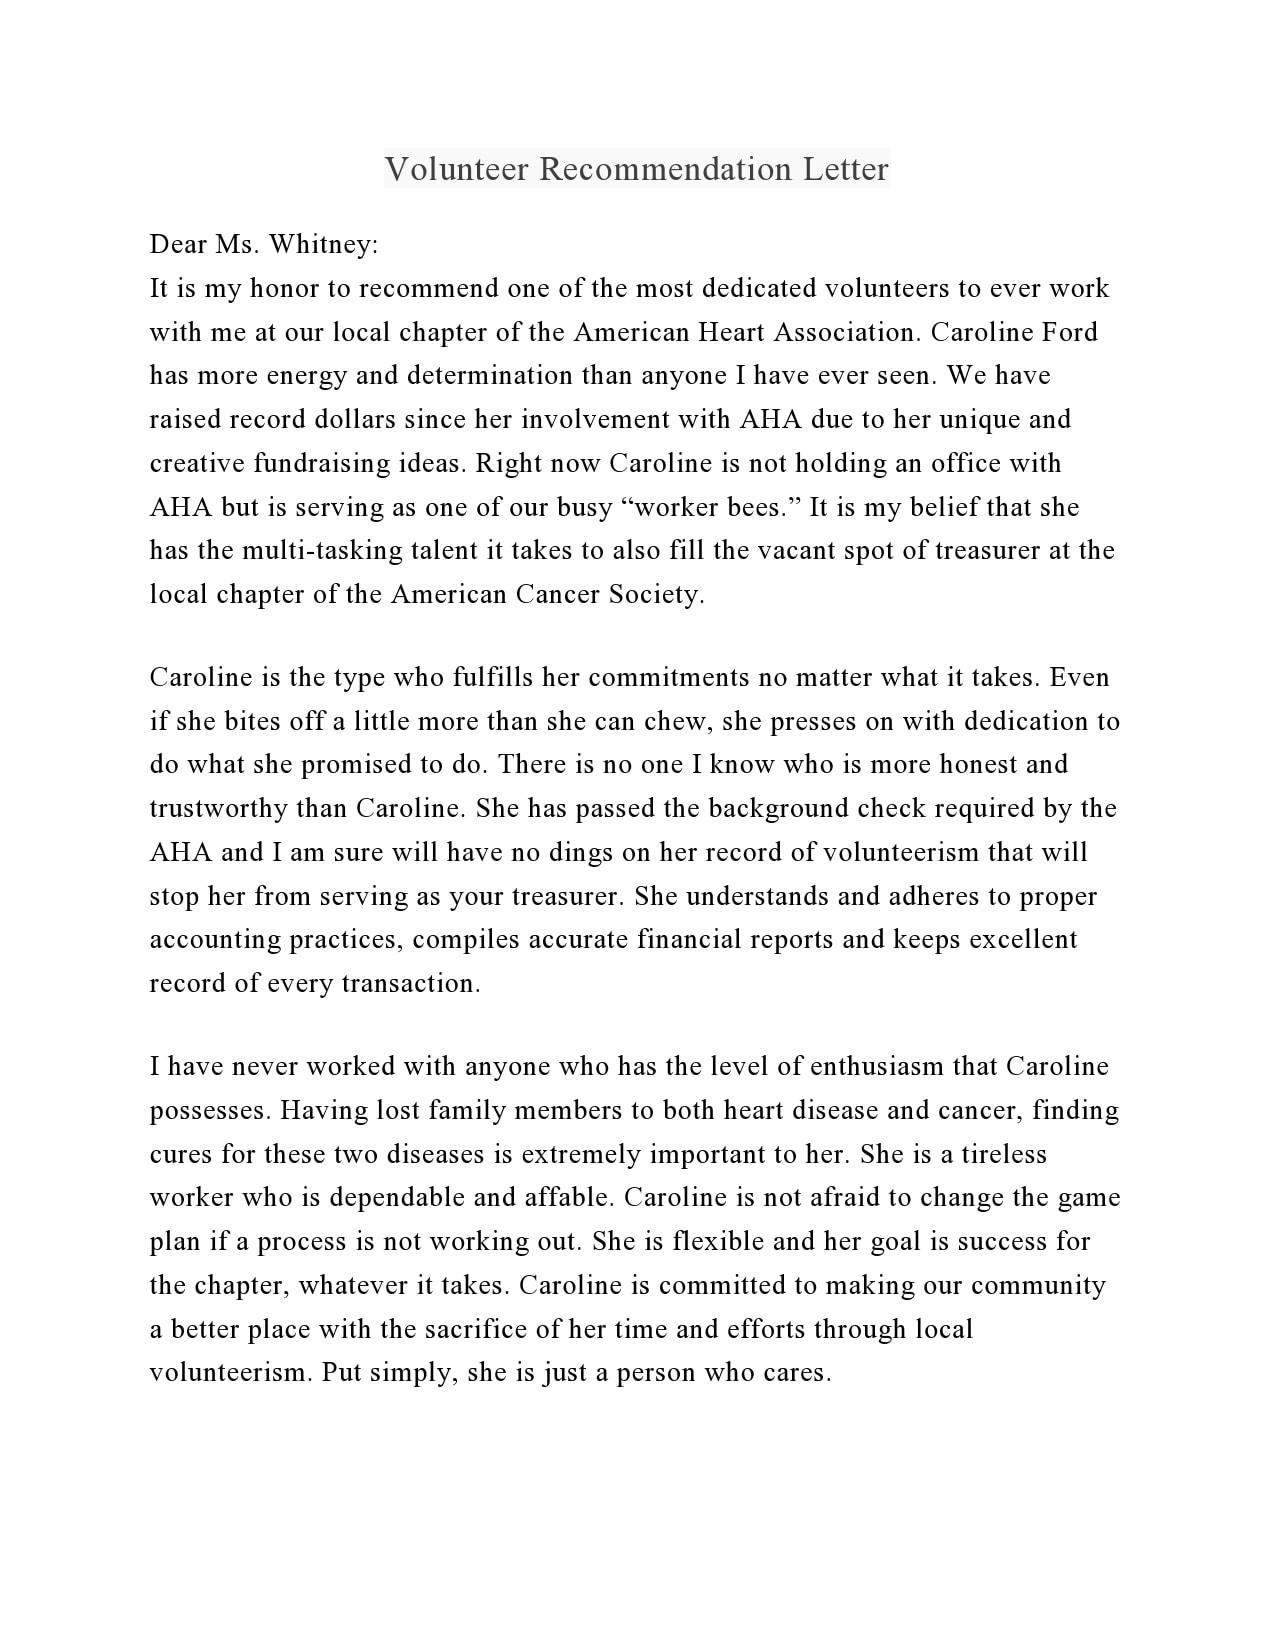 volunteers letter 10